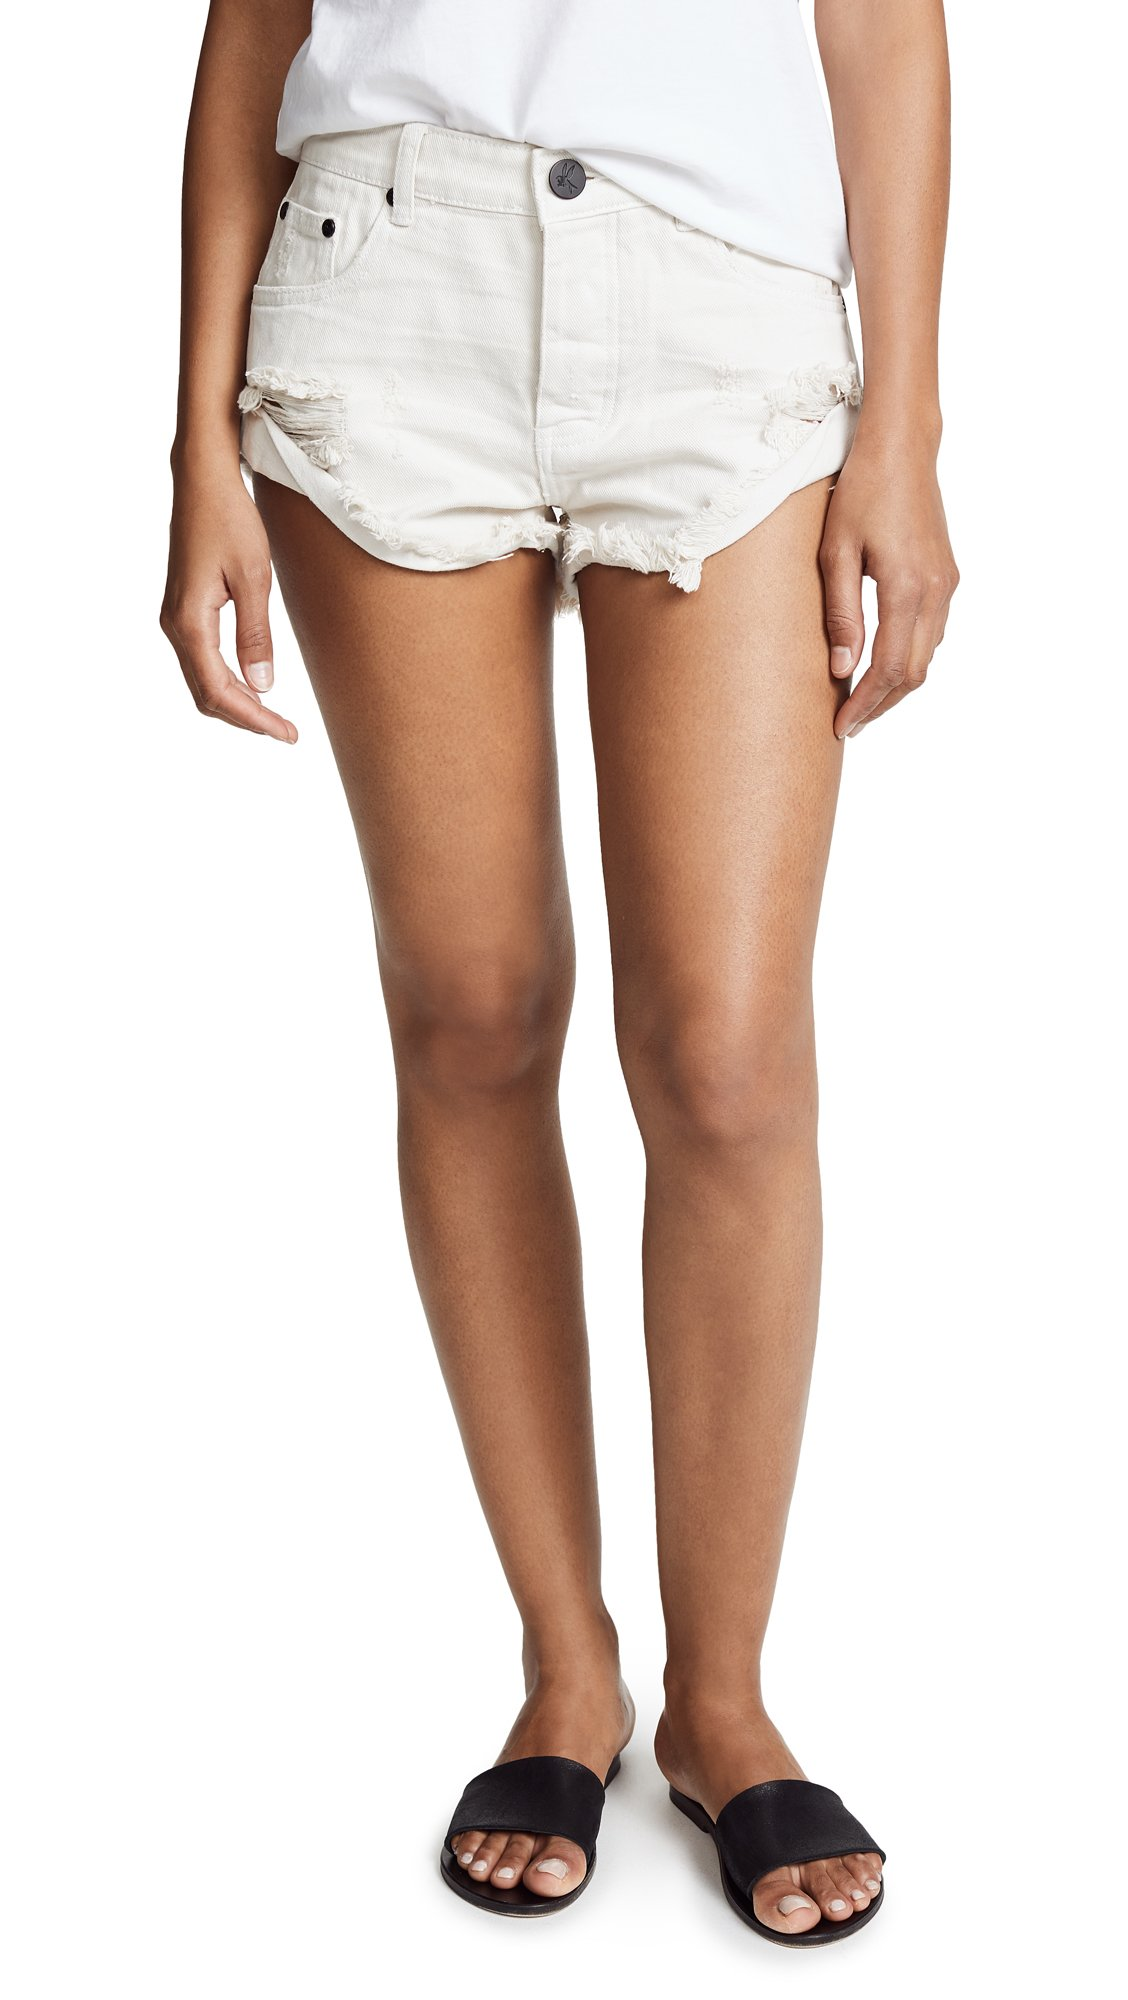 One Teaspoon Women's Worn White Bandit Shorts, Worn White, 25